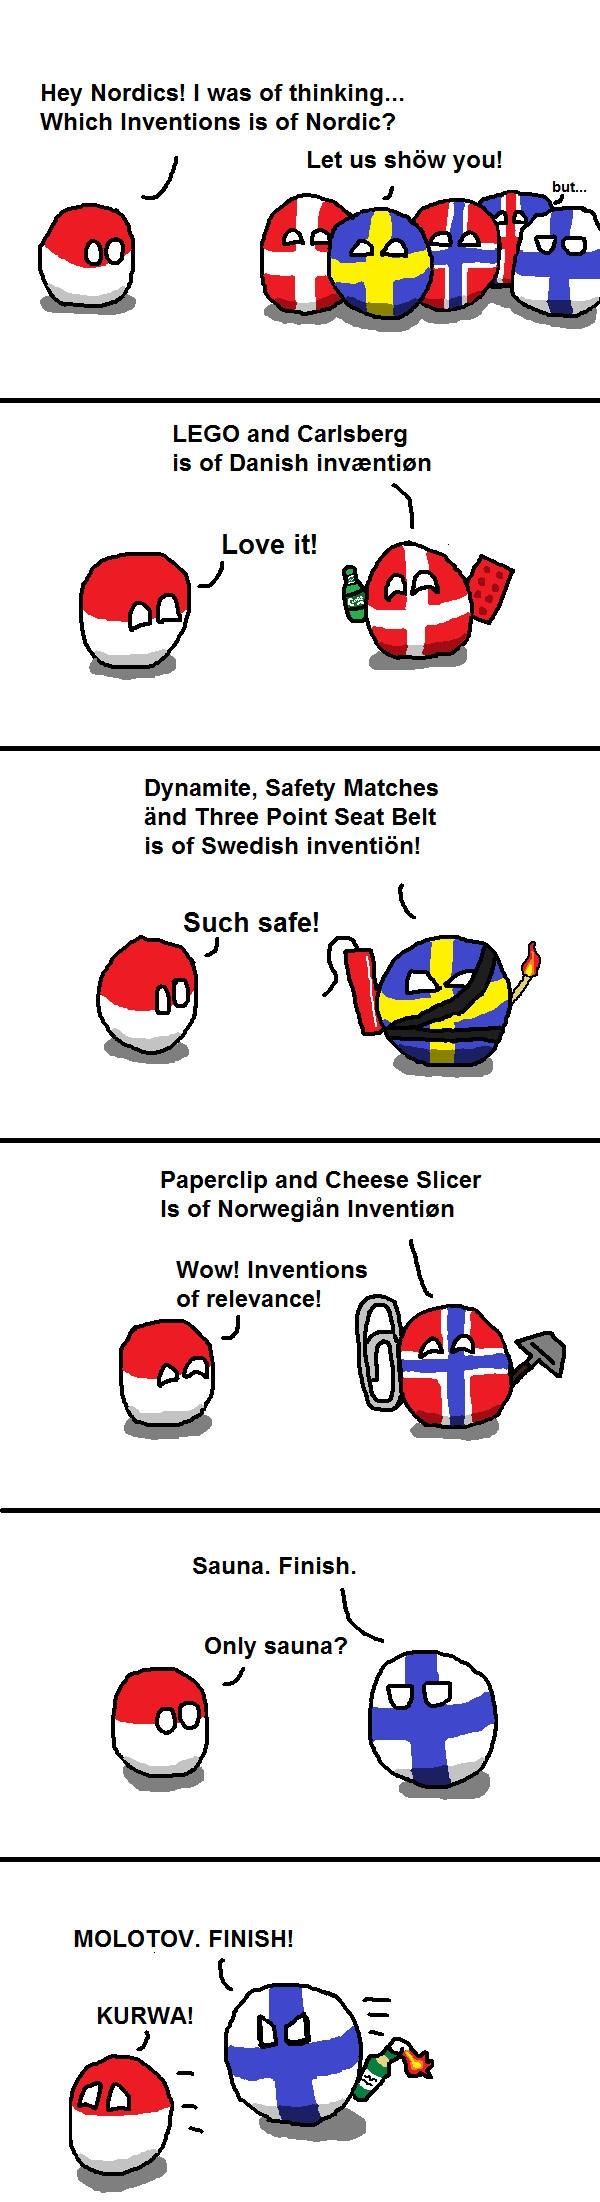 Nordic inventions